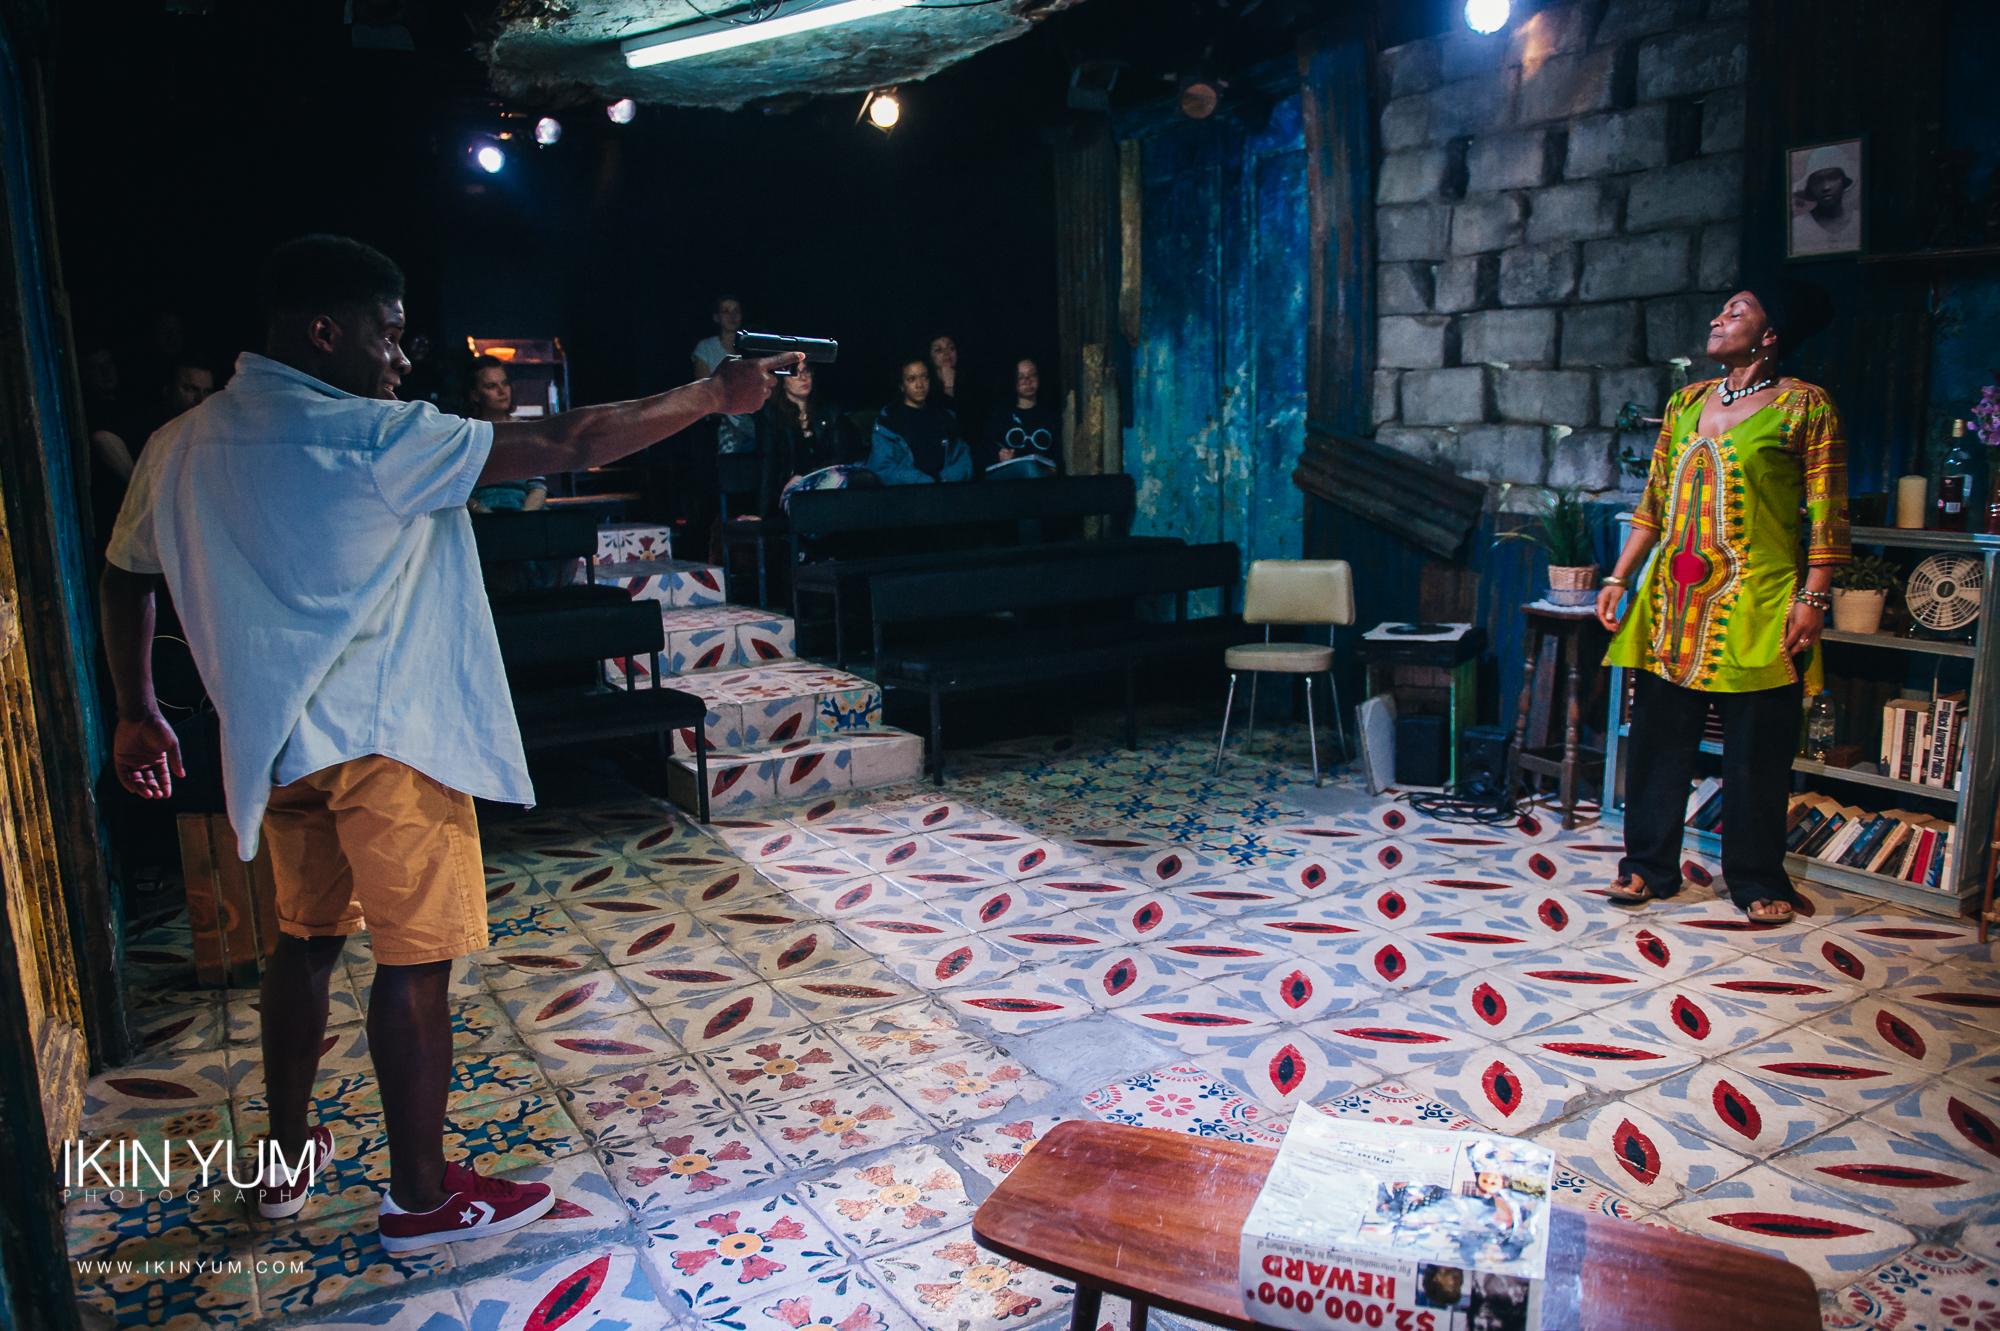 Assata Taught Me - Gate Theatre - Ikin Yum Photography-184.jpg